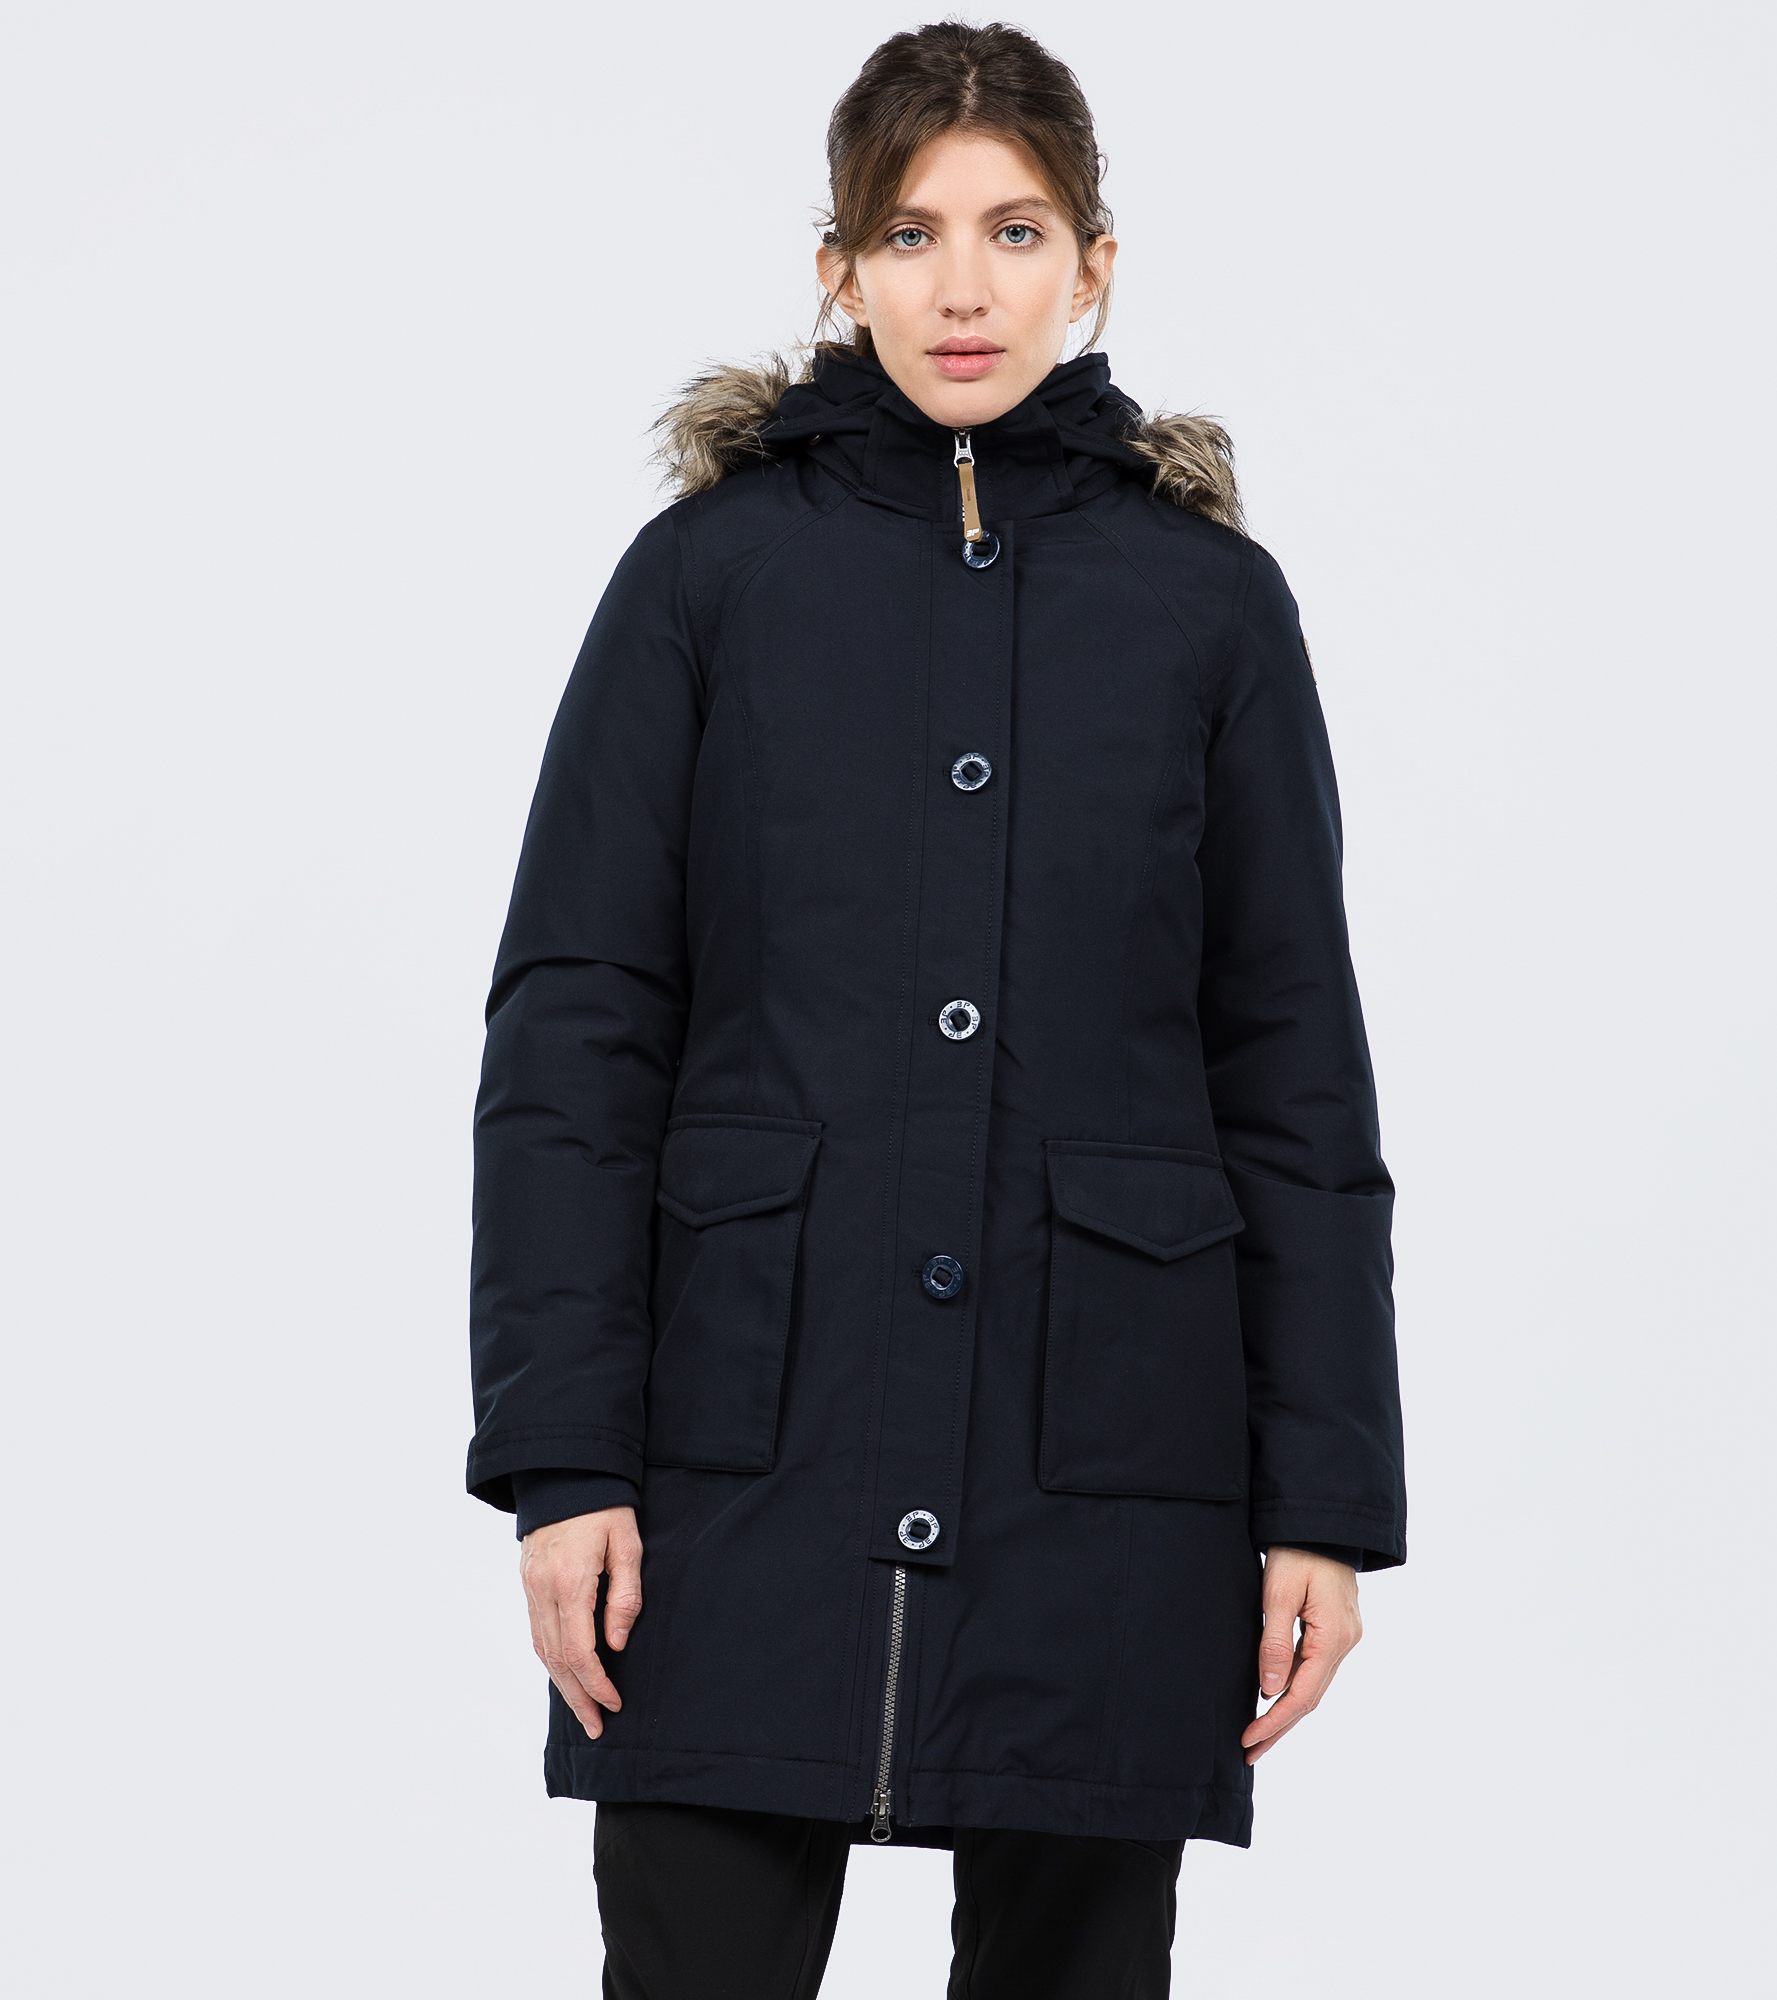 IcePeak Куртка утепленная женская IcePeak Arcadia, размер 52